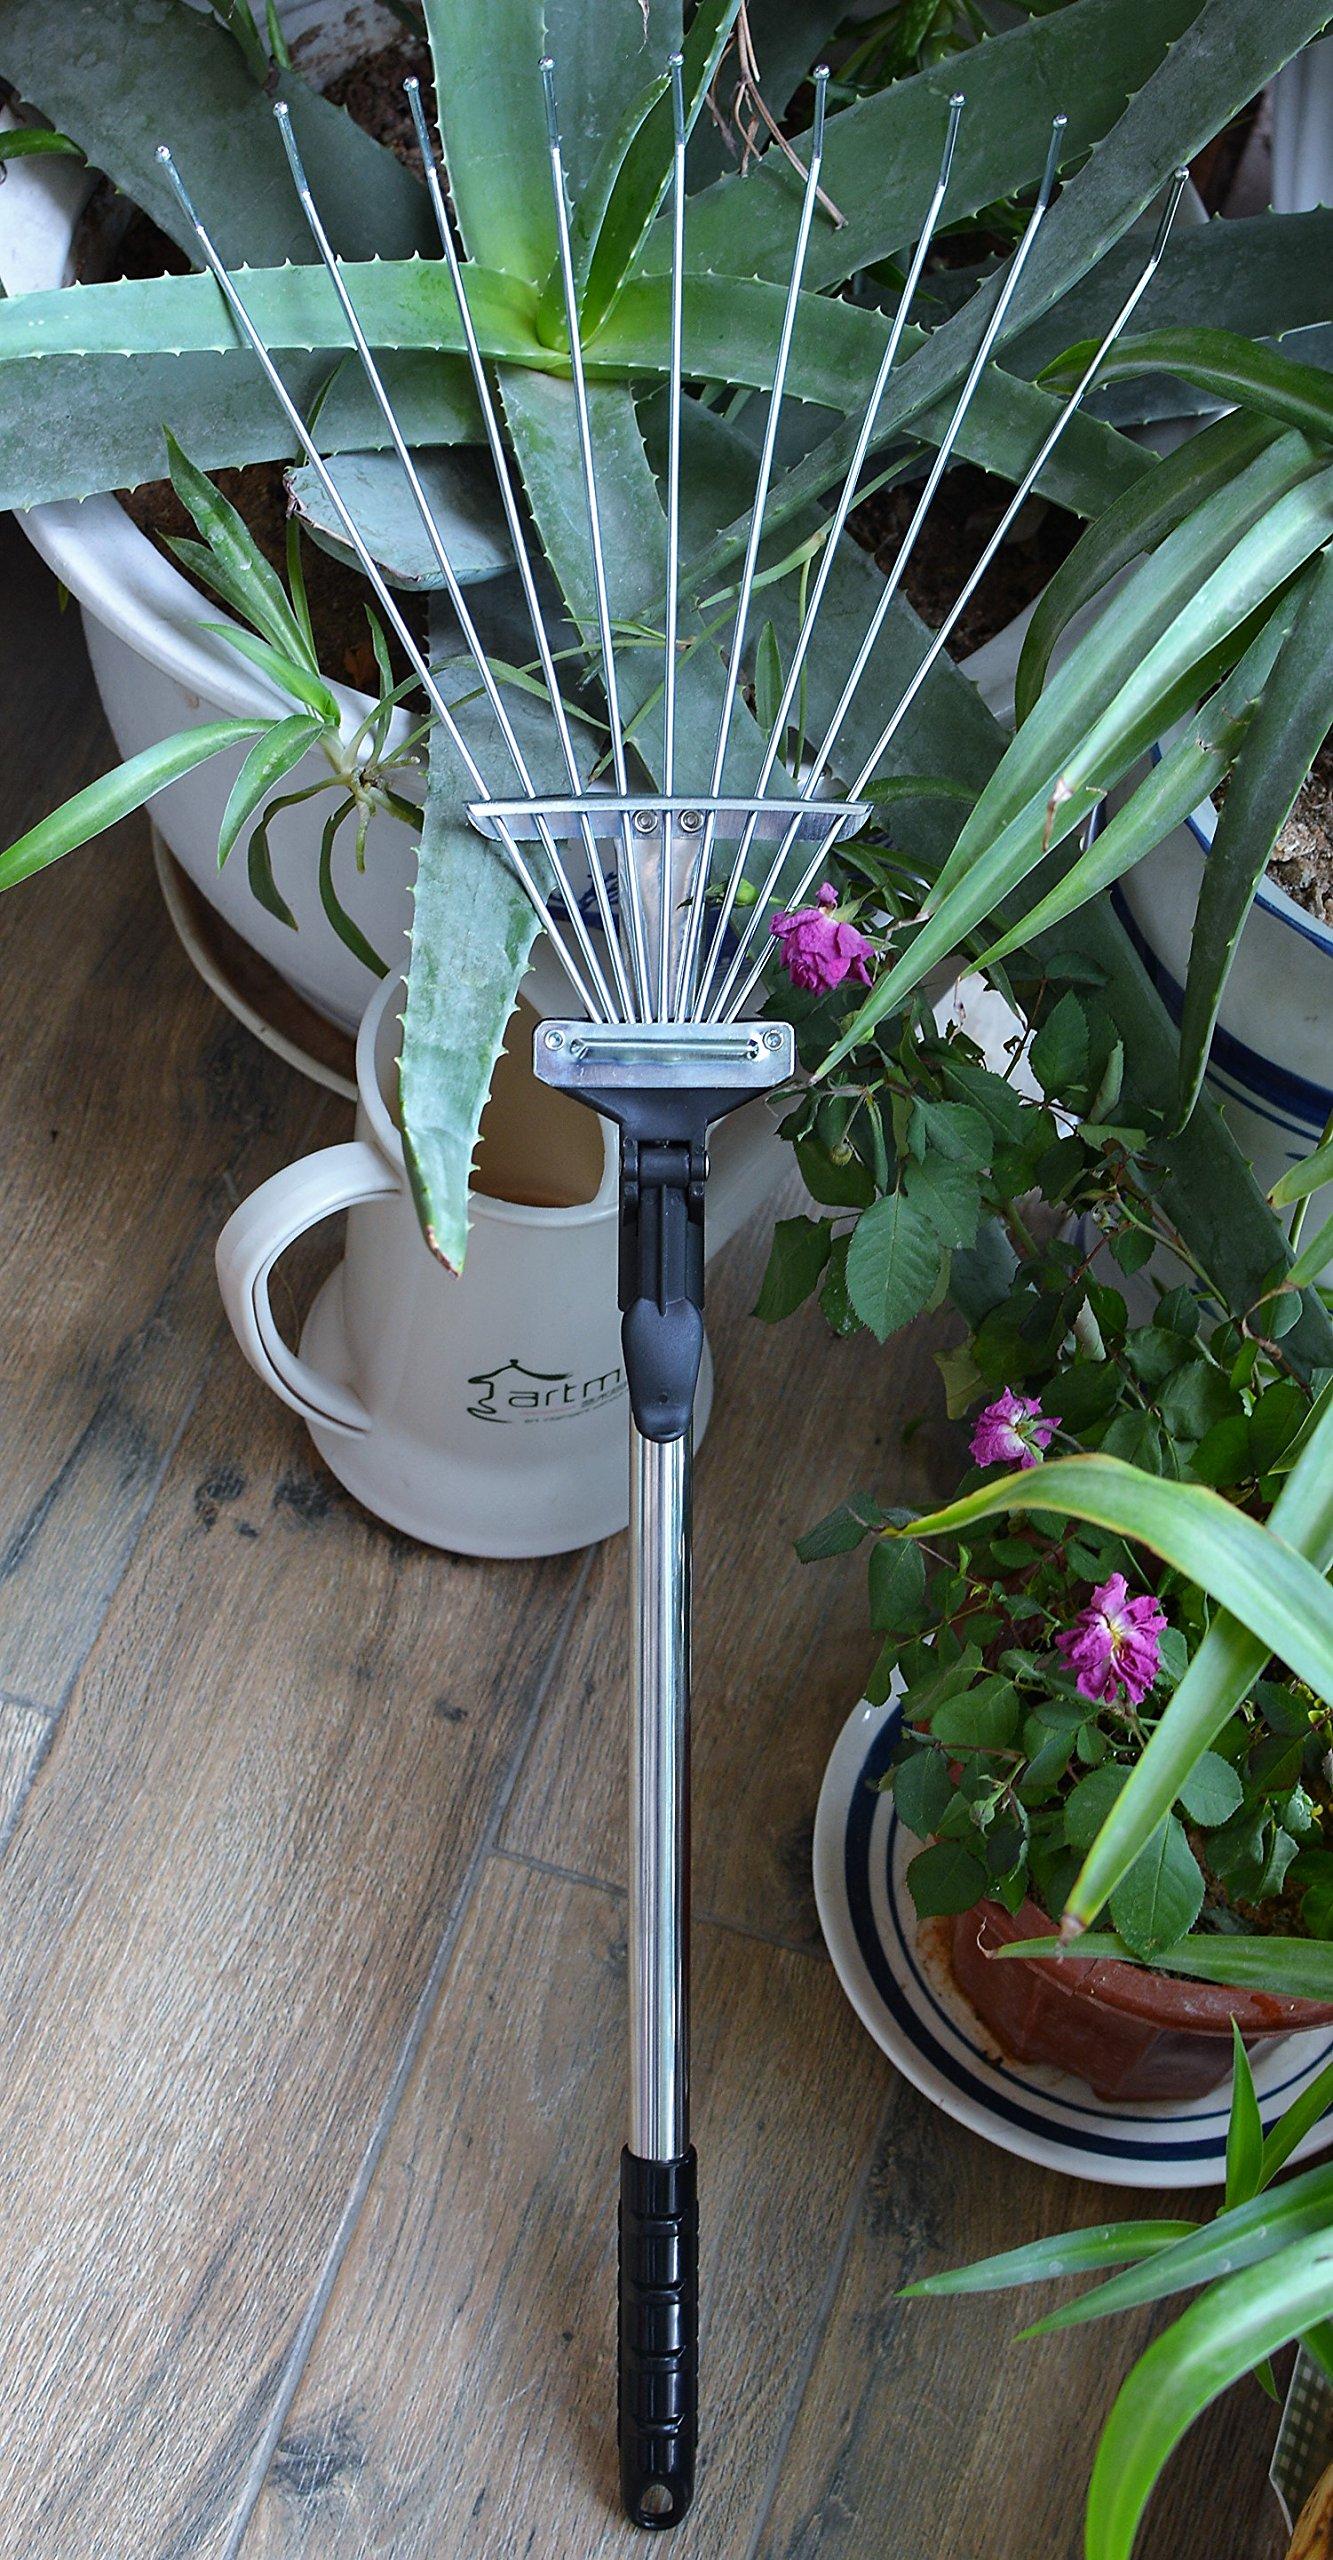 ZaoProteks ZP5802 Stainless Steel Garden Leaf Rakes, Hay Rake, Lawn rake (Black Handle) by ZP ZaoProteks (Image #8)